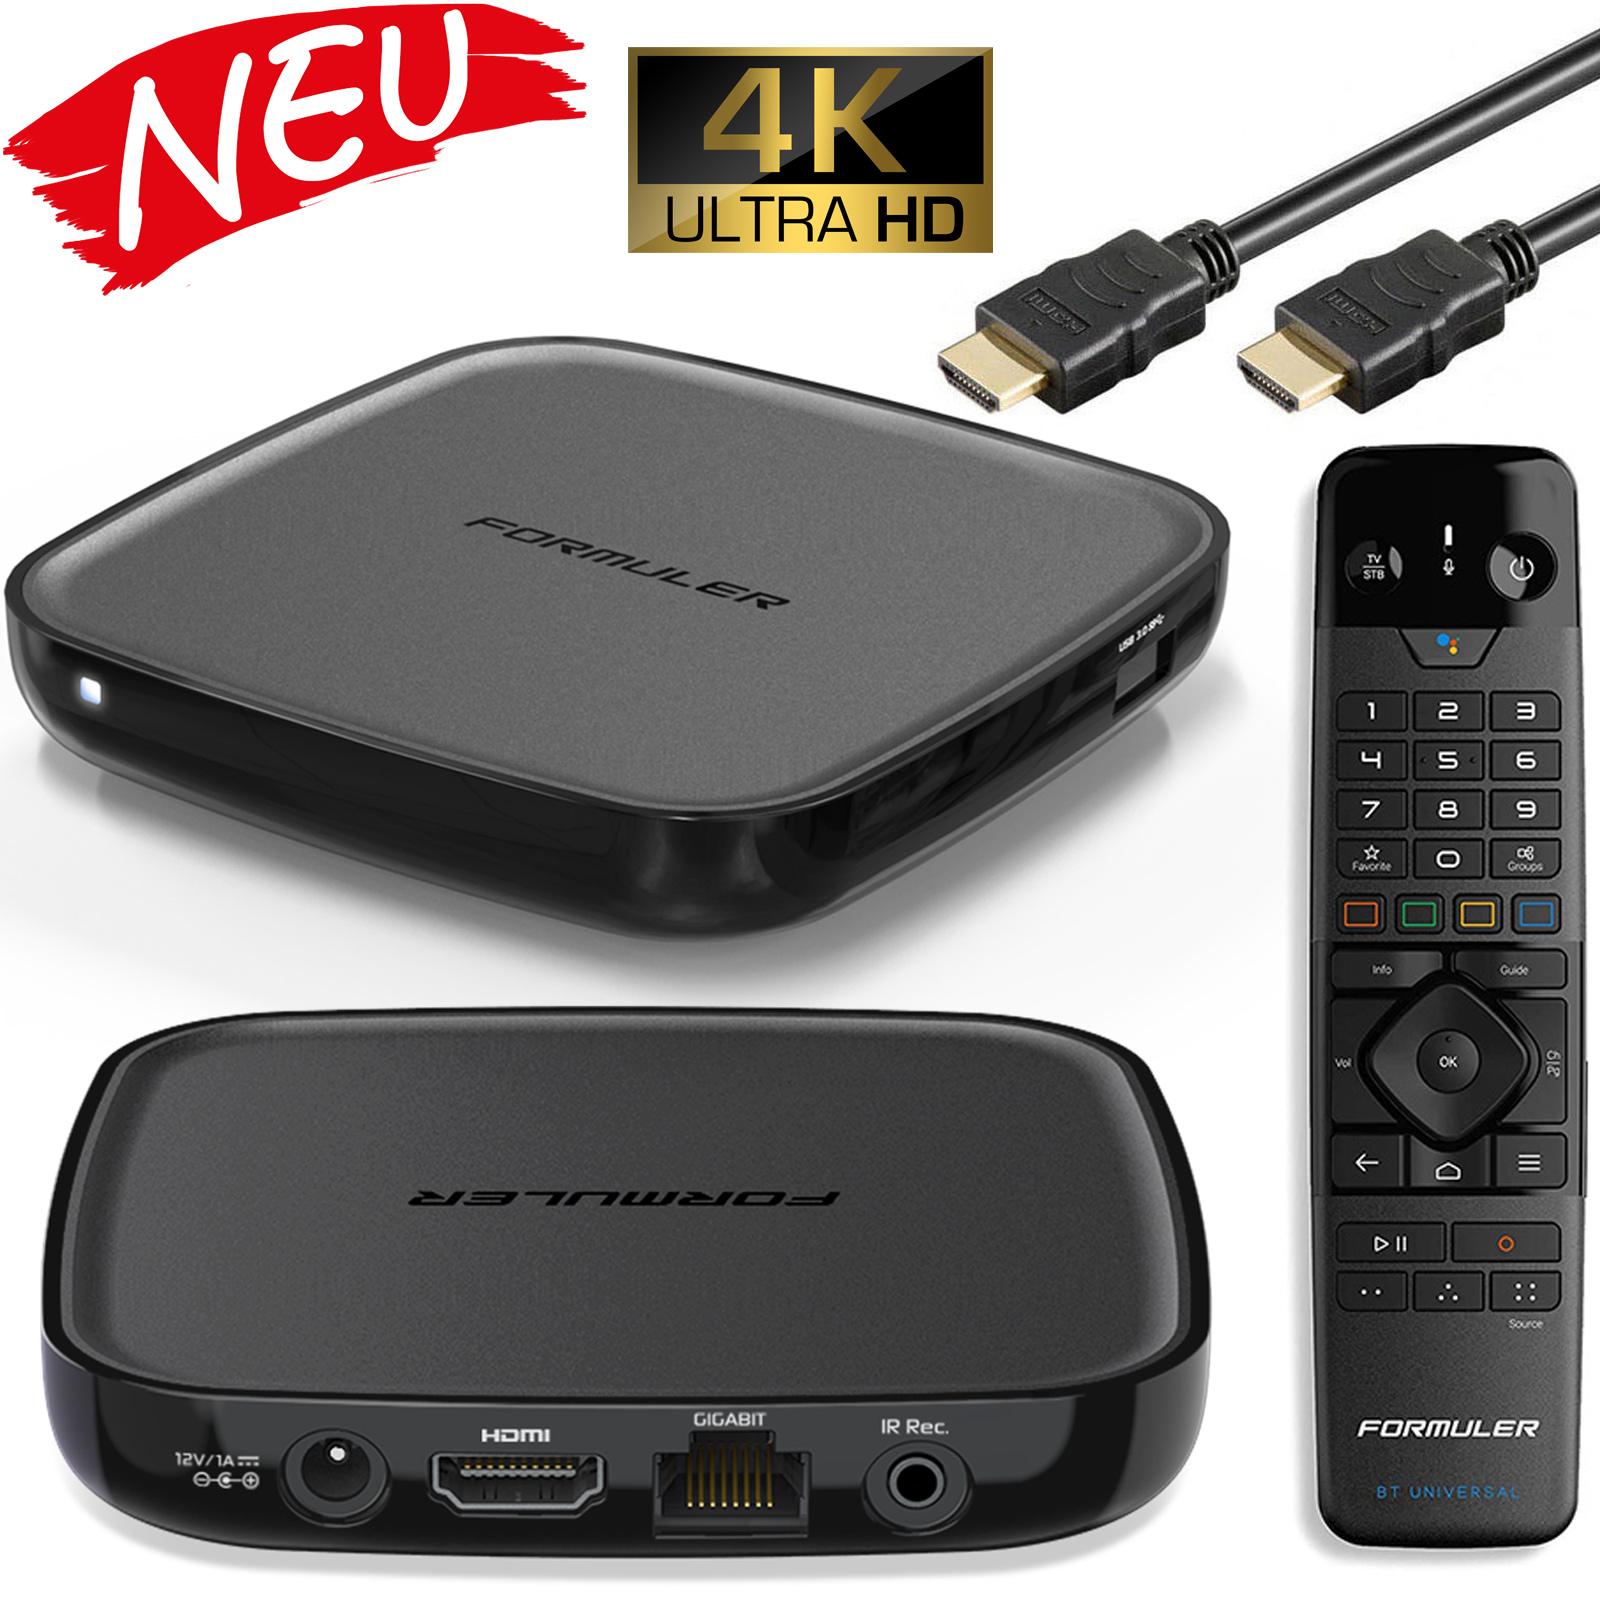 Formuler GTV 5G 4K IPTV Android 9 Player H.265 2GB RAM 16GB Flash WLAN 5GHz Wifi